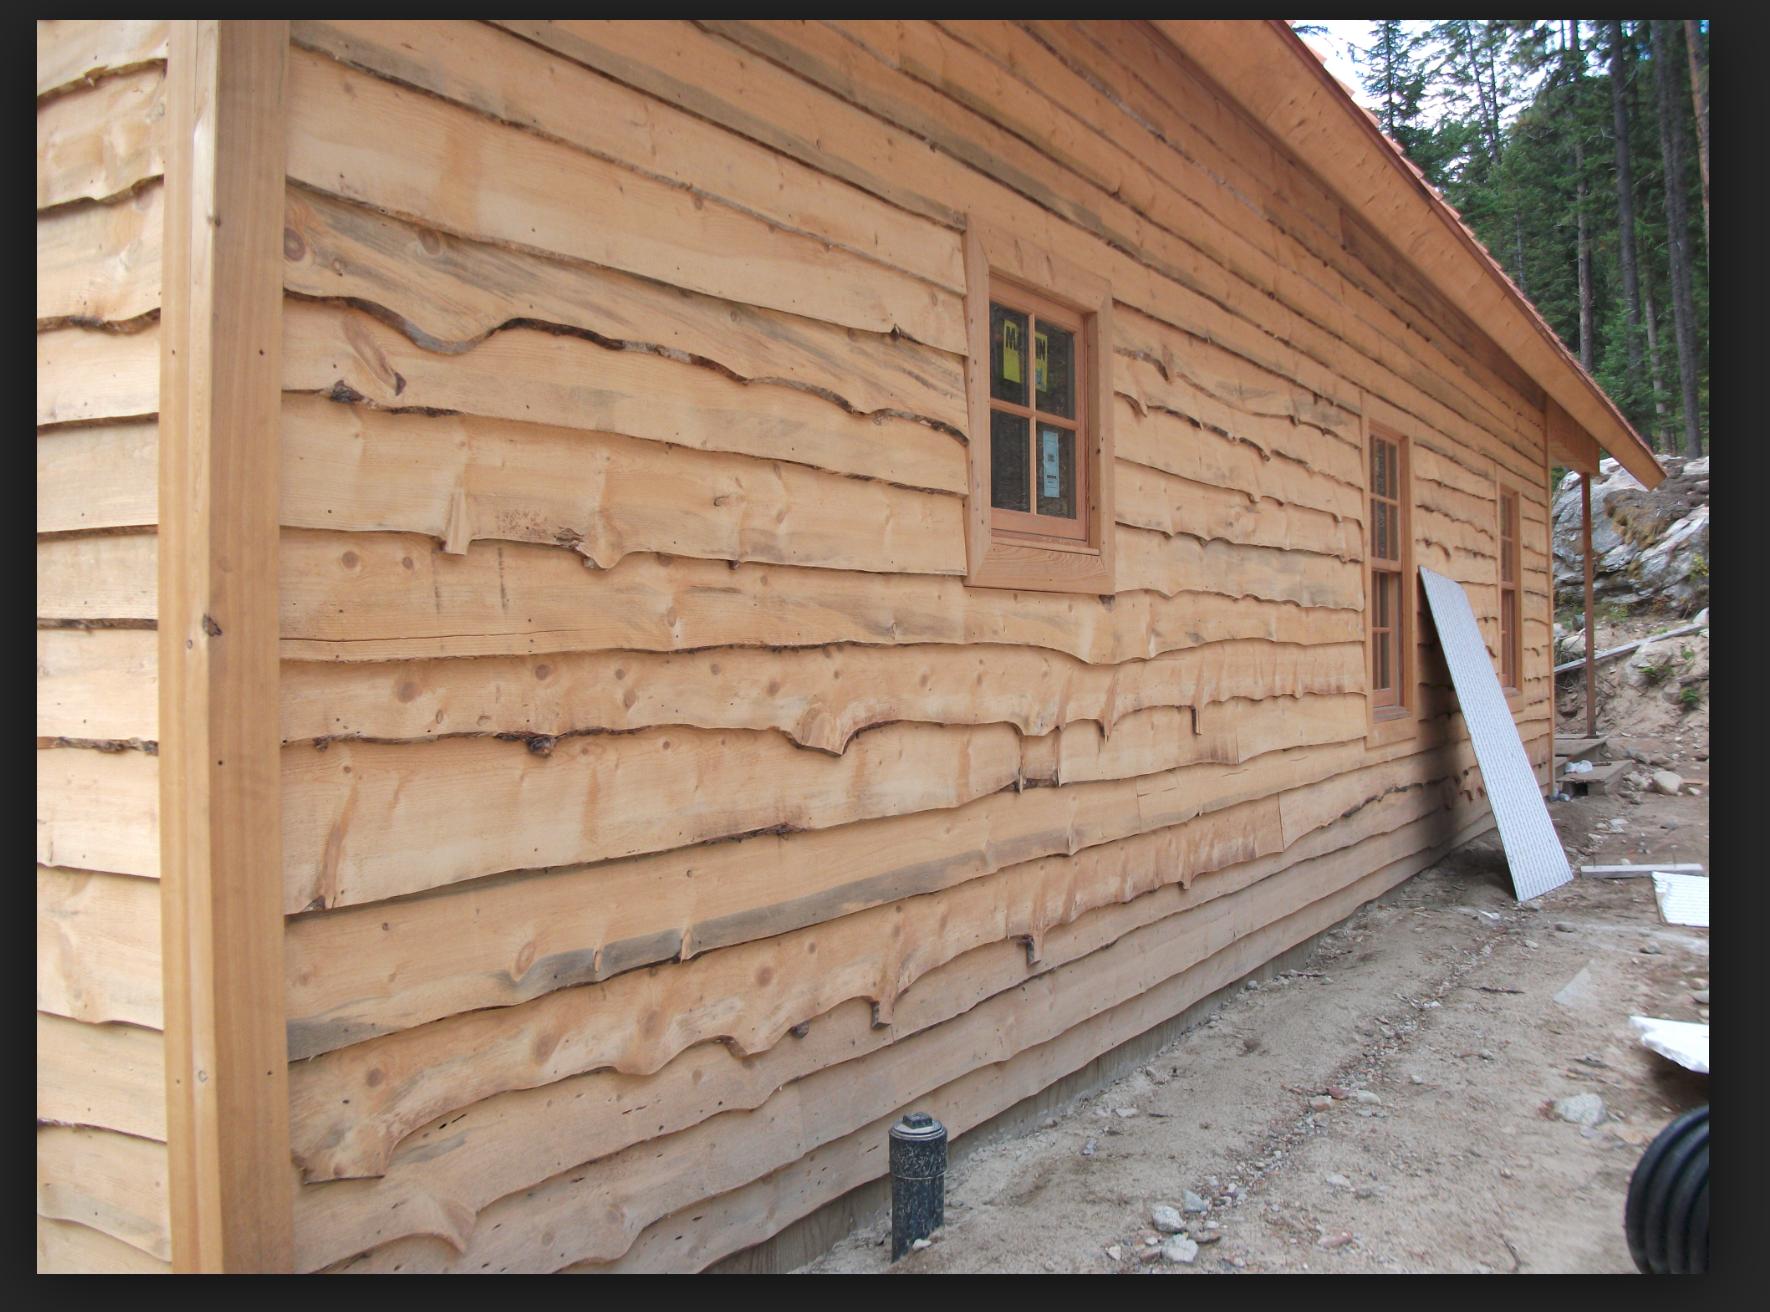 Live Edge Siding Before It Weathers Wood Siding Exterior Wood Cladding Exterior Rustic Wood Floors